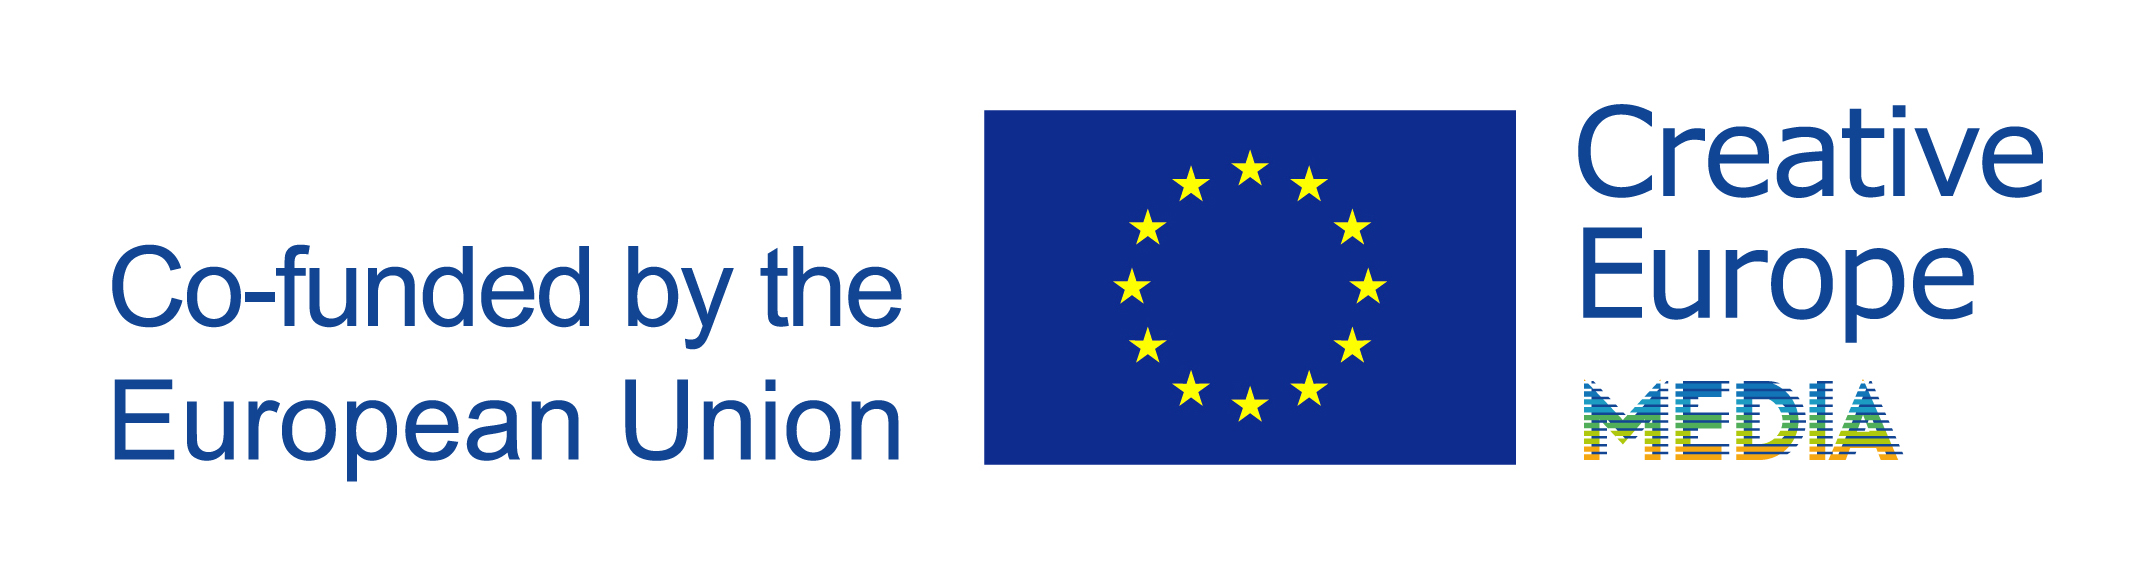 Creative Europe Logo.jpeg